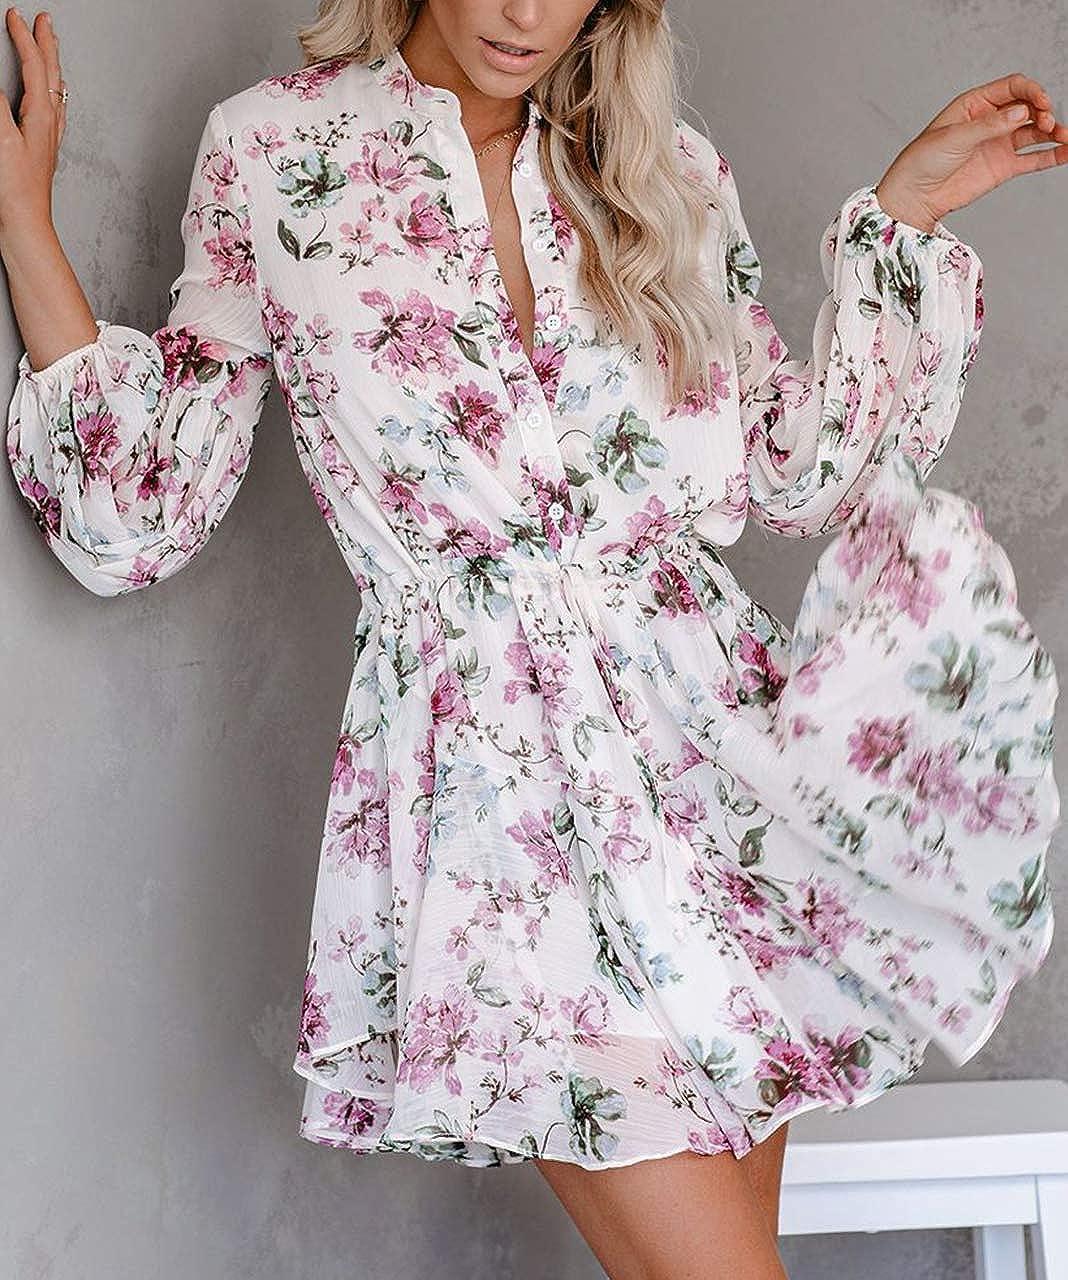 ROVLET Womens Floral Boho V-Neck Button Down Long Sleeve Ruffle Elastic Waist Printed Mini Dress Beach Sundress